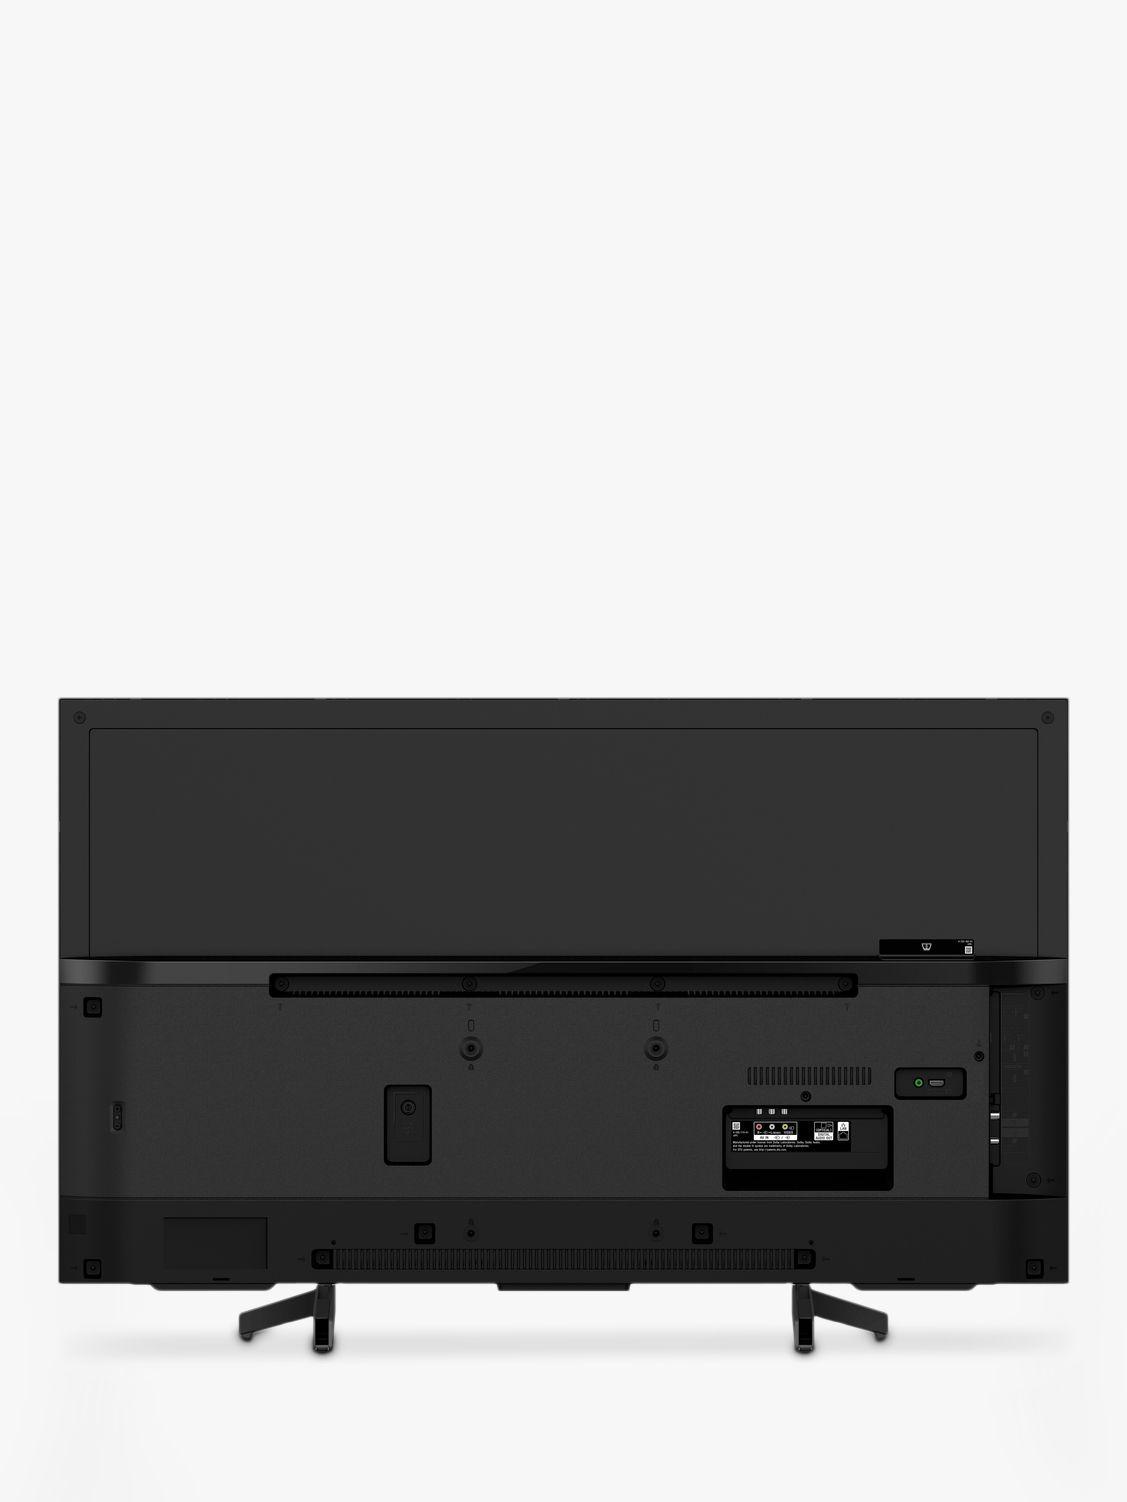 Sony Bravia Kd49xg7093 2019 Led Hdr 4k Ultra Hd Smart Tv 49